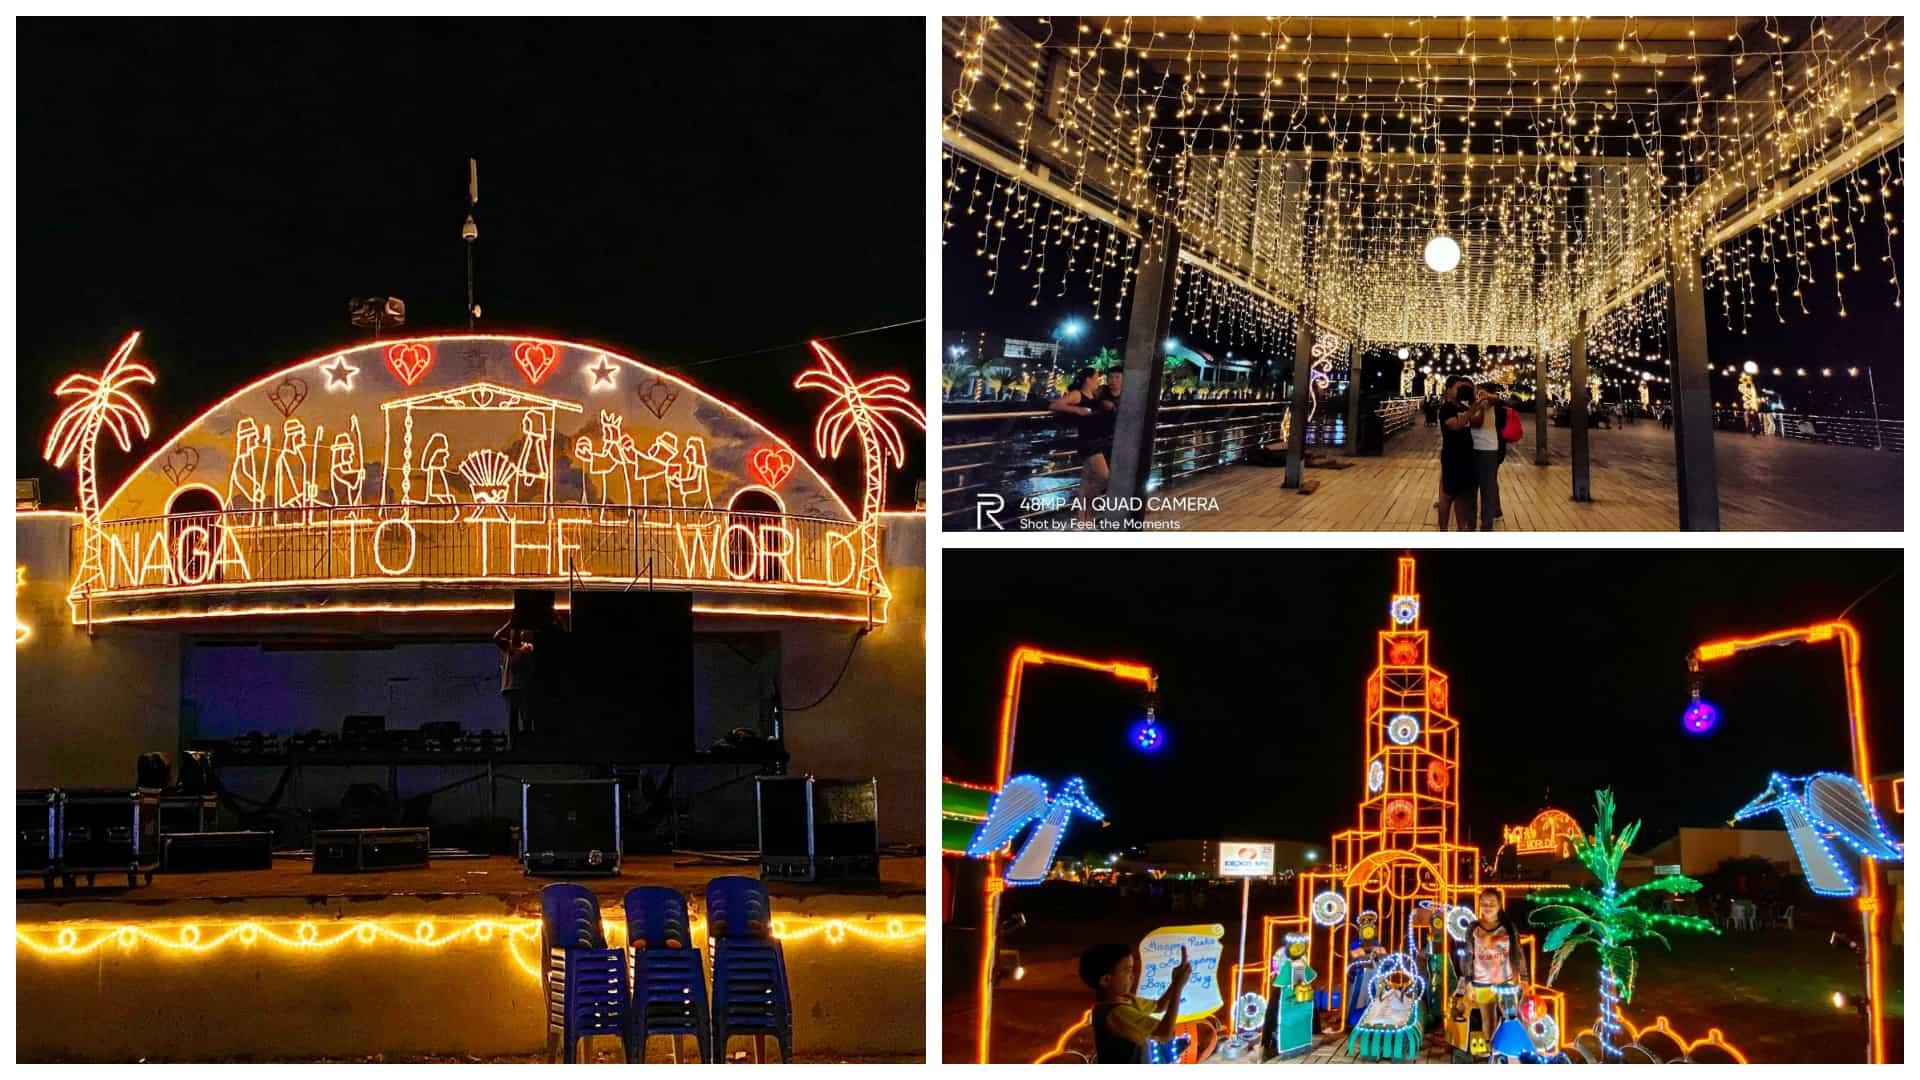 Christmas In Cebu 2021 Look Around The World Christmas Displays At Naga City Boardwalk Sugbo Ph Cebu